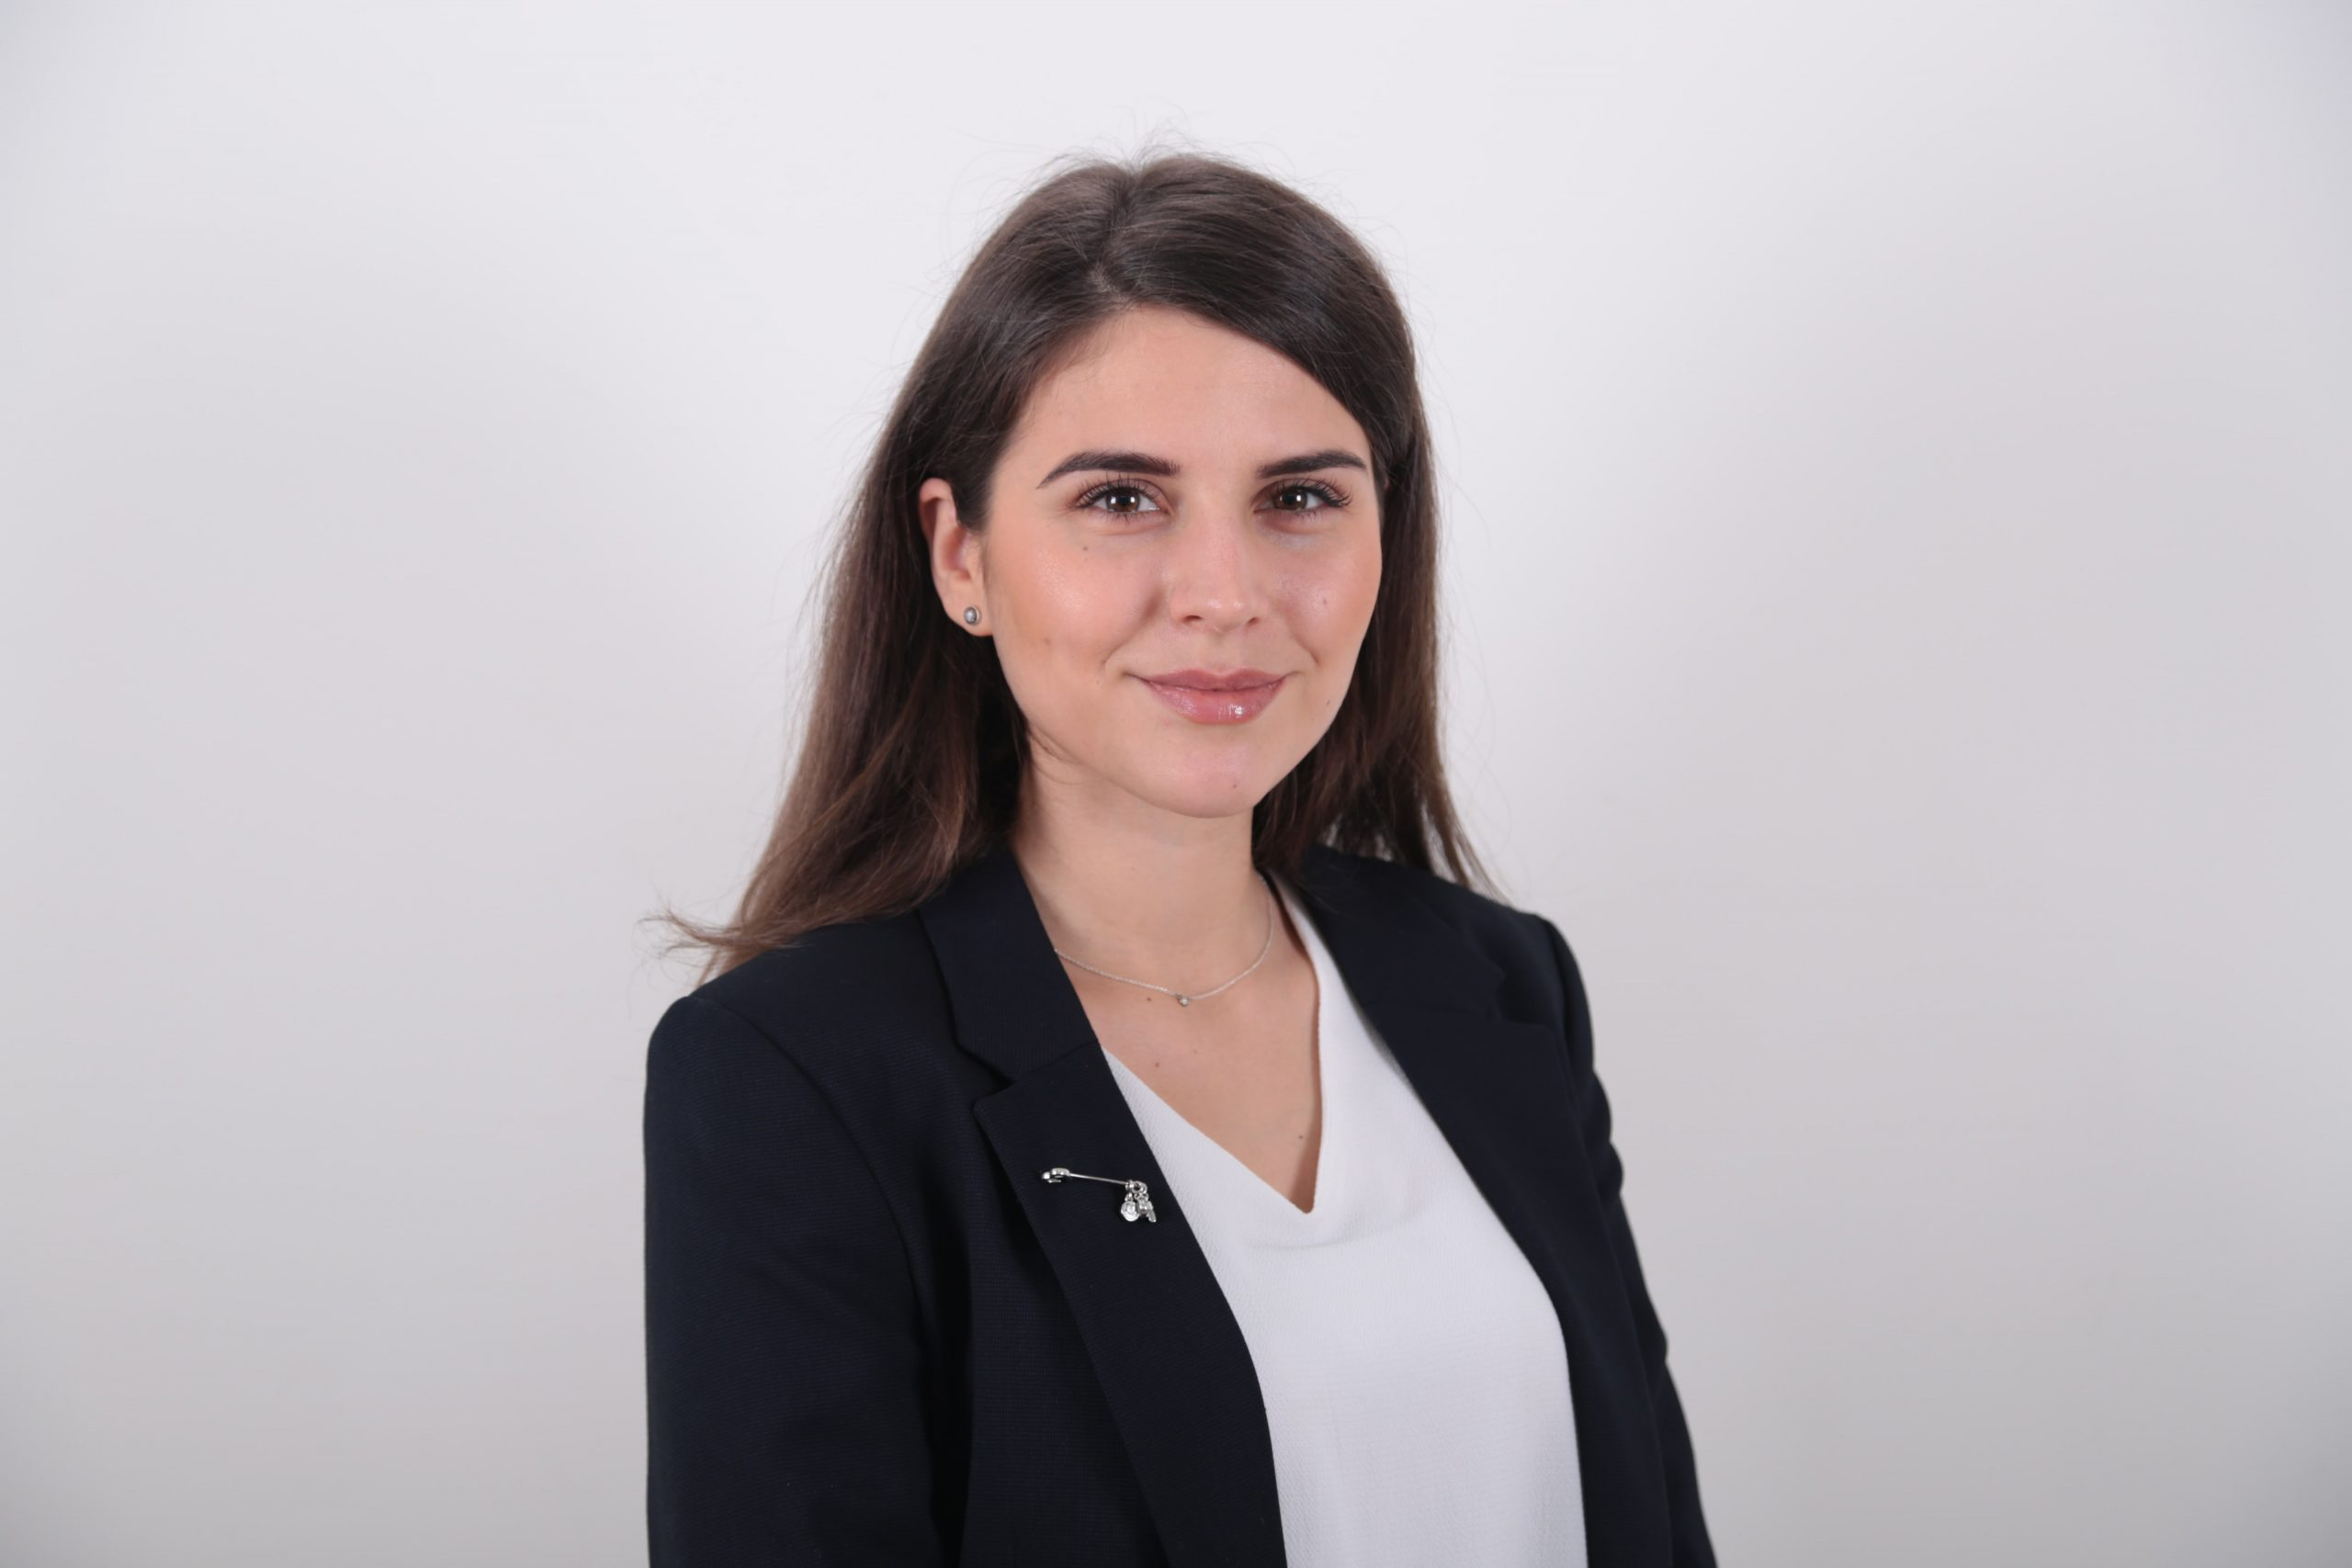 Liri Kosovare Bllaca